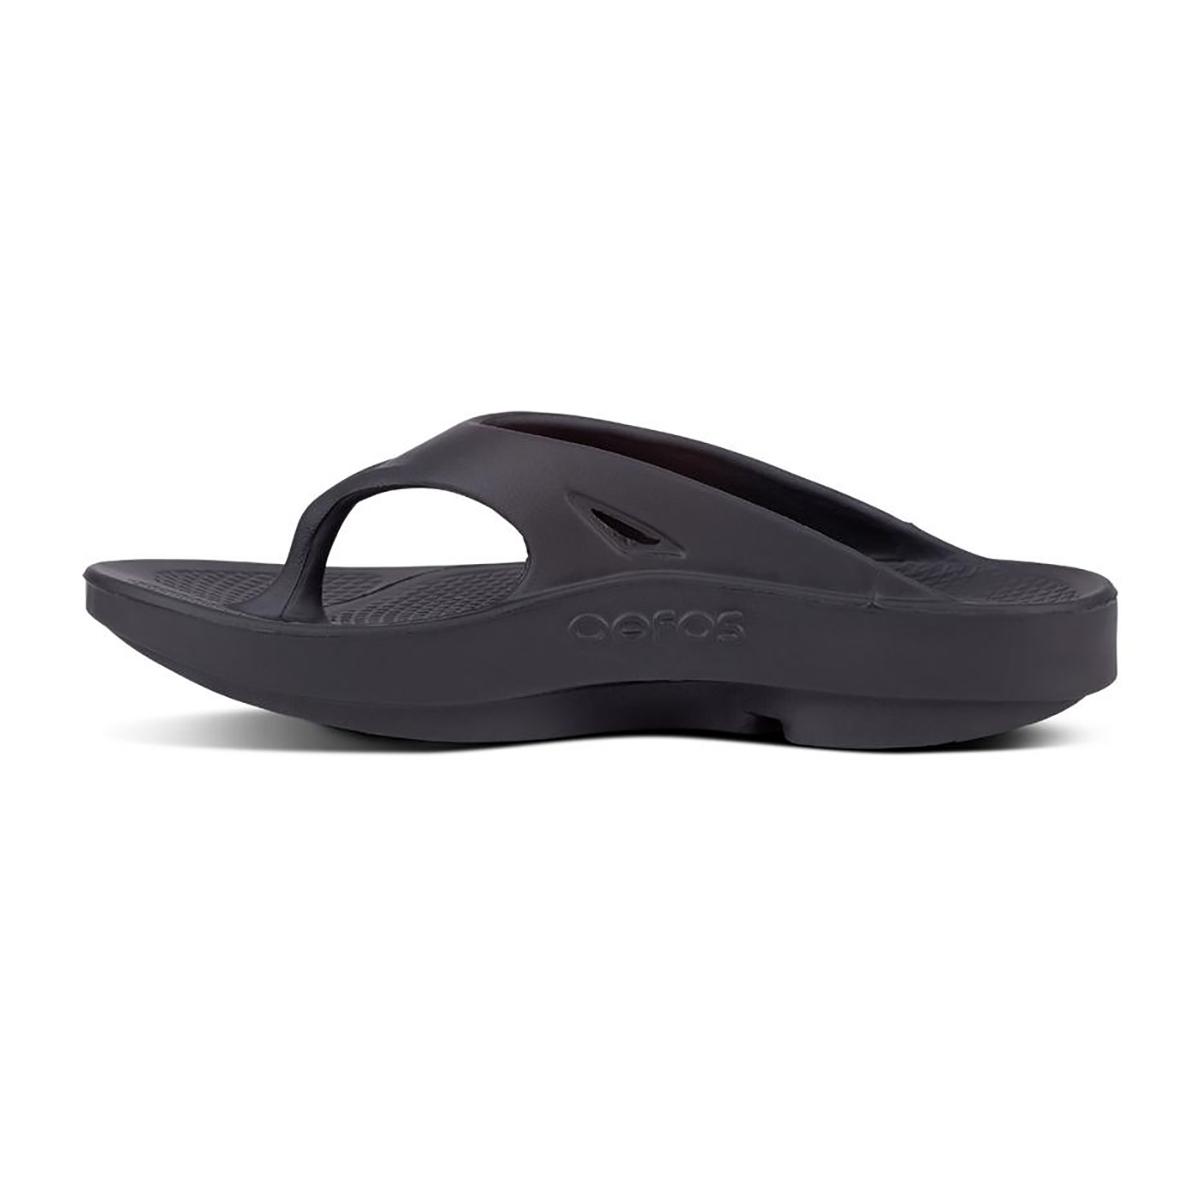 Oofos OOriginal Recovery Sandal - Color: Black - Size: M3/W5 - Width: Regular, Black, large, image 2